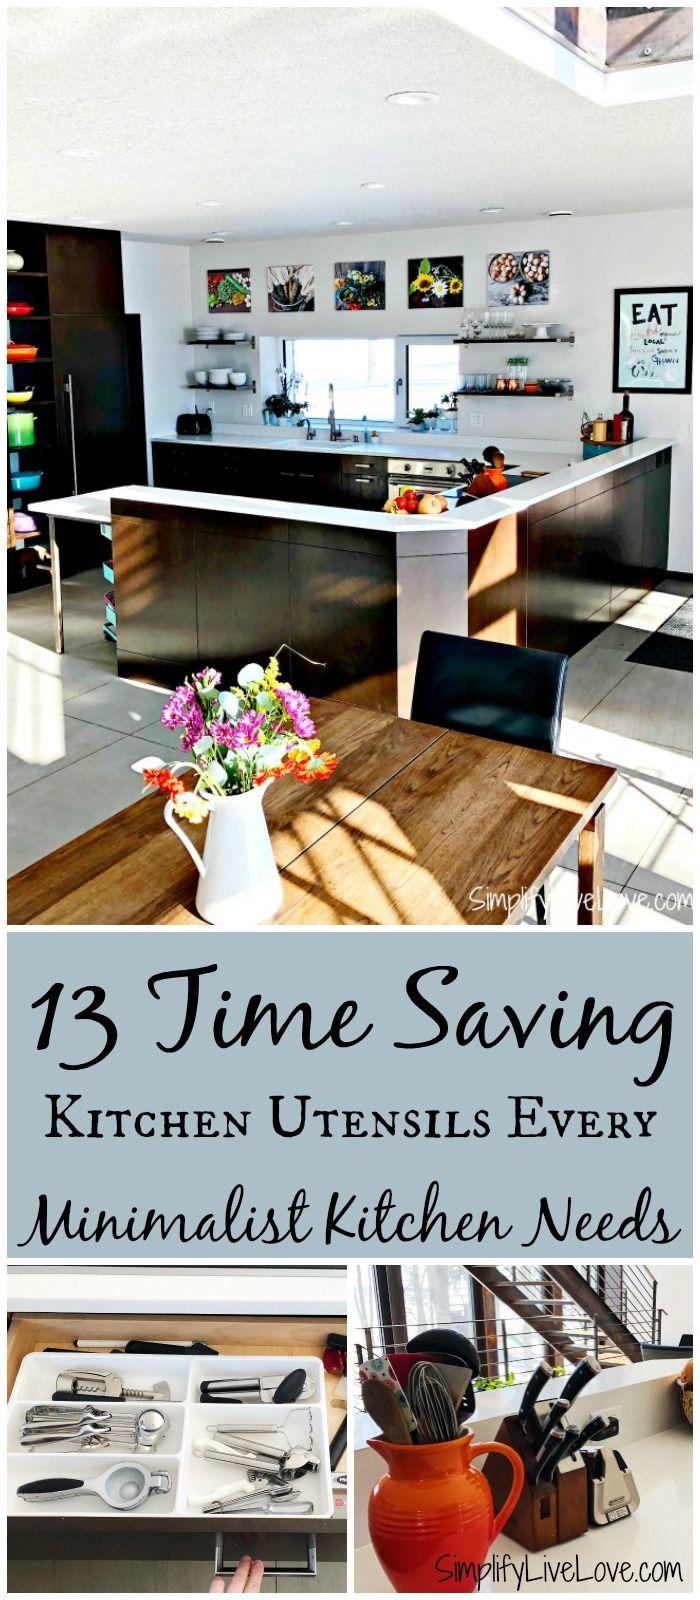 13 Time Saving Kitchen Utensils Every Minimalist Kitchen Needs ...